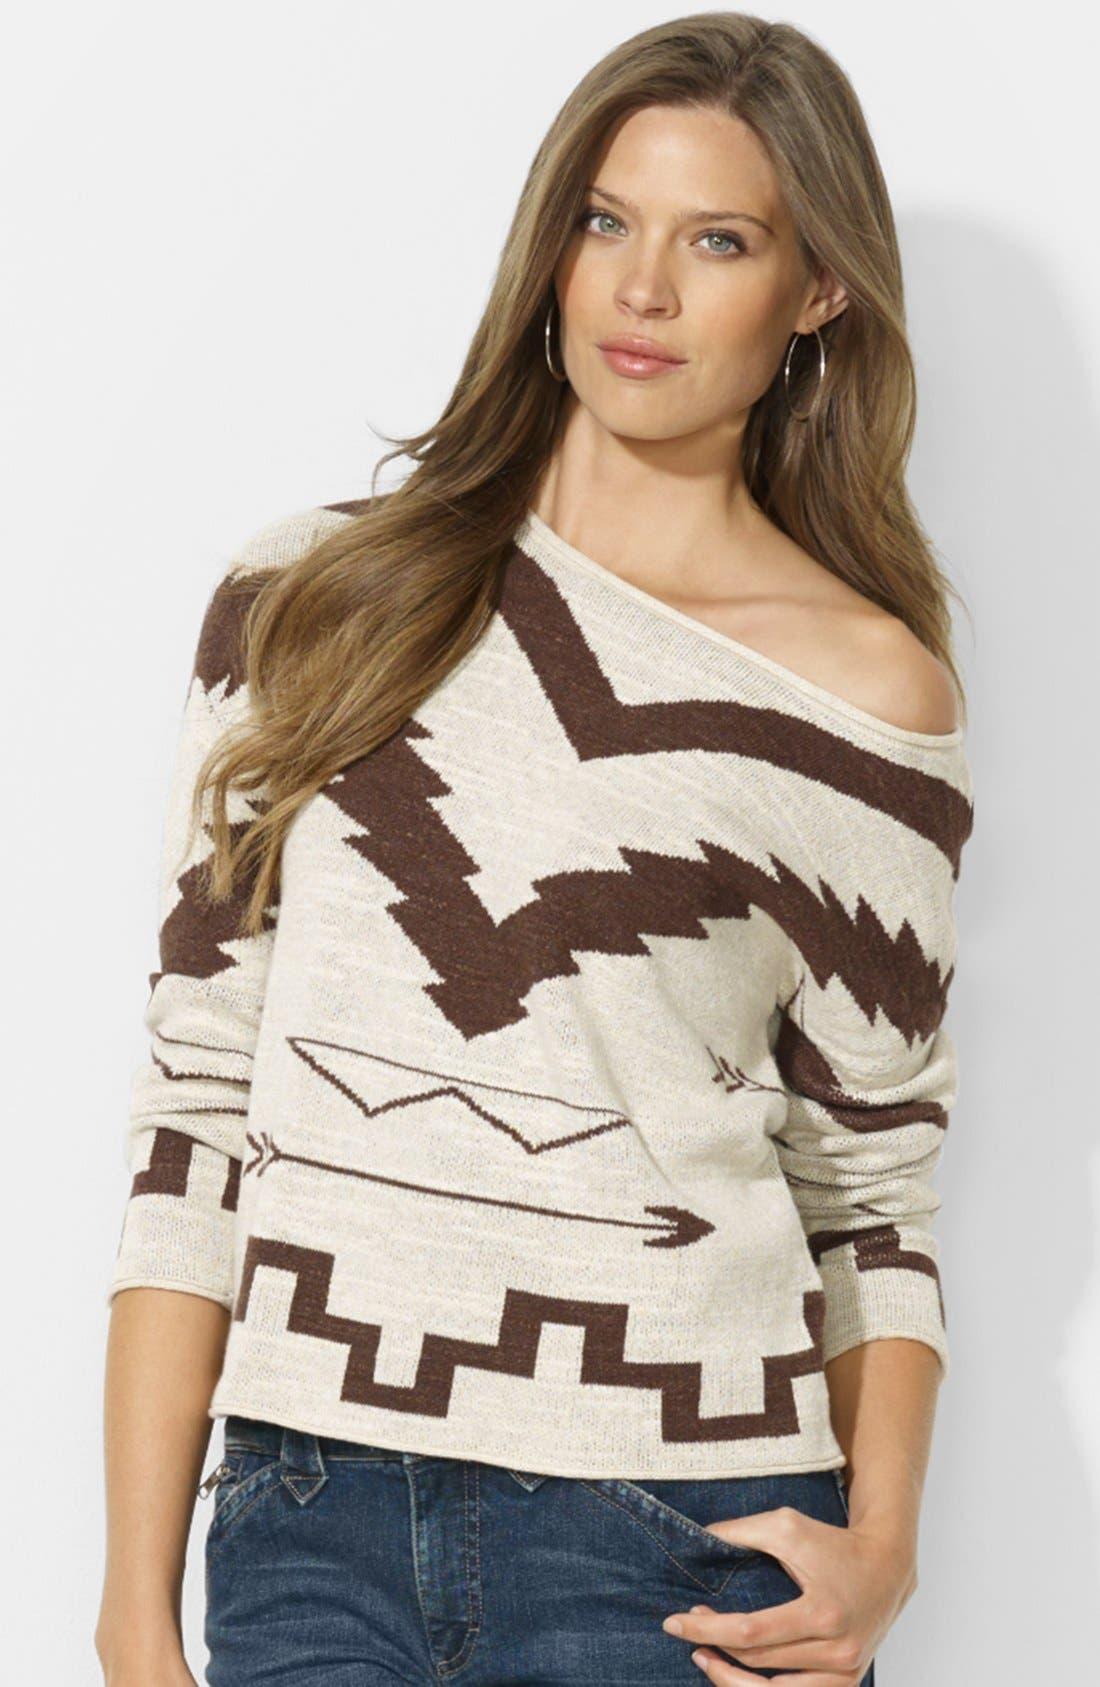 Alternate Image 1 Selected - Lauren Ralph Lauren Patterned Boat Neck Sweater (Petite)